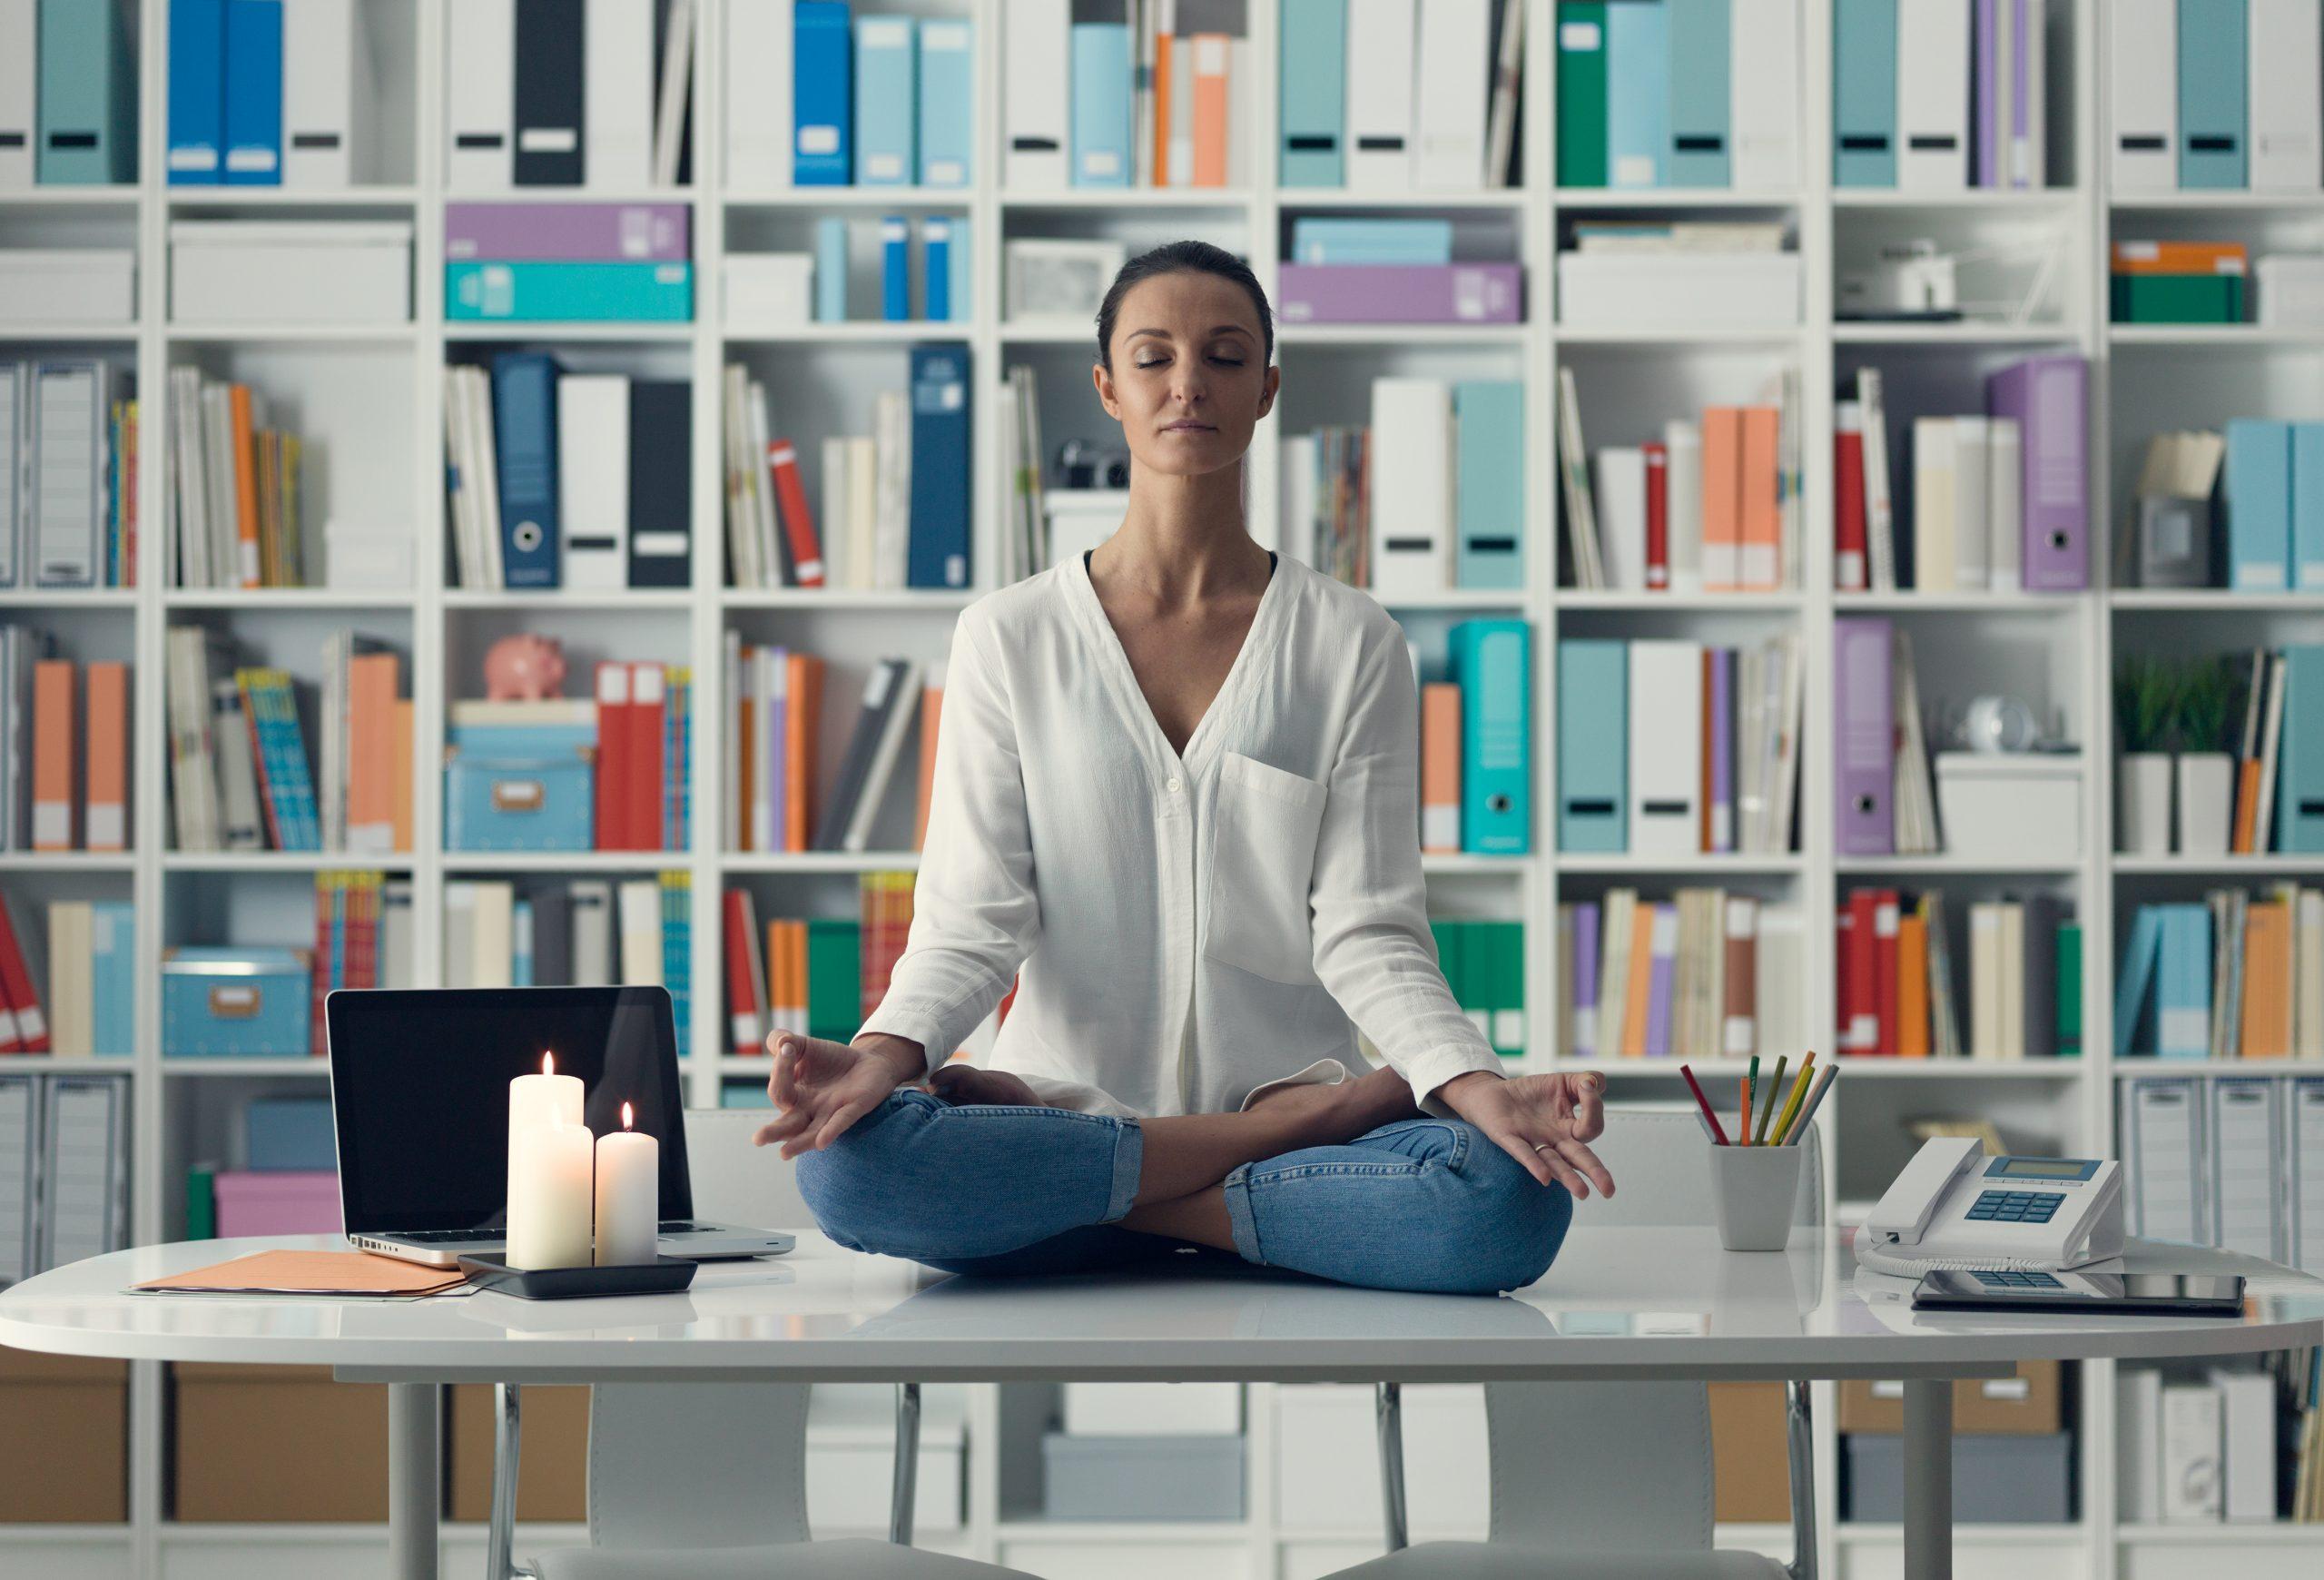 practice-mindfulness